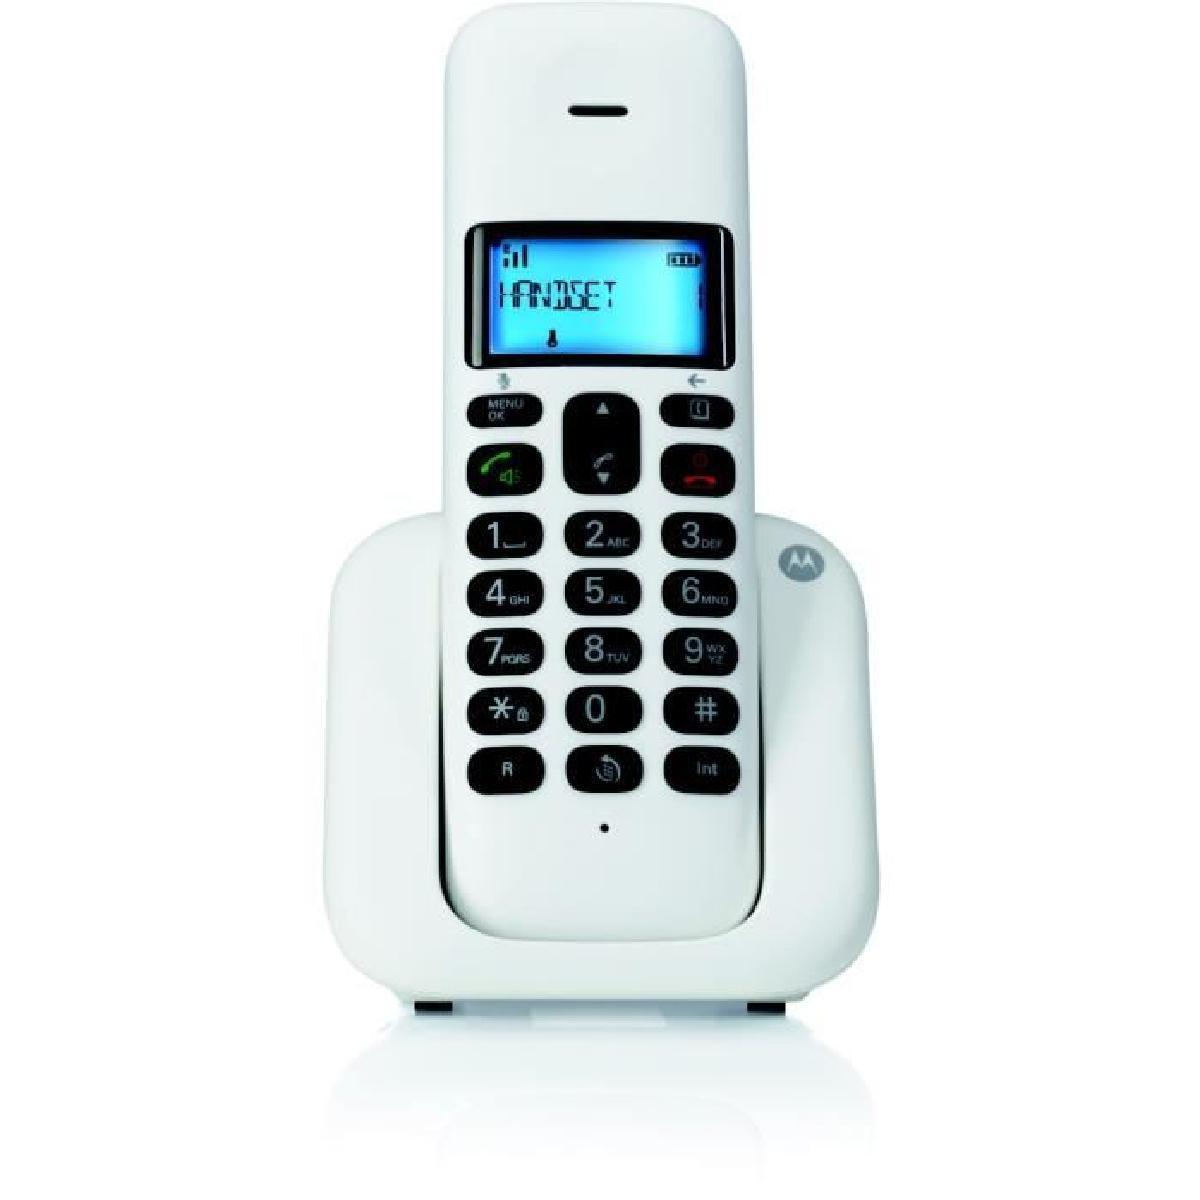 e5a239ac1db Motorola Digital Cordless Phone T301 White 2 Years Warranty